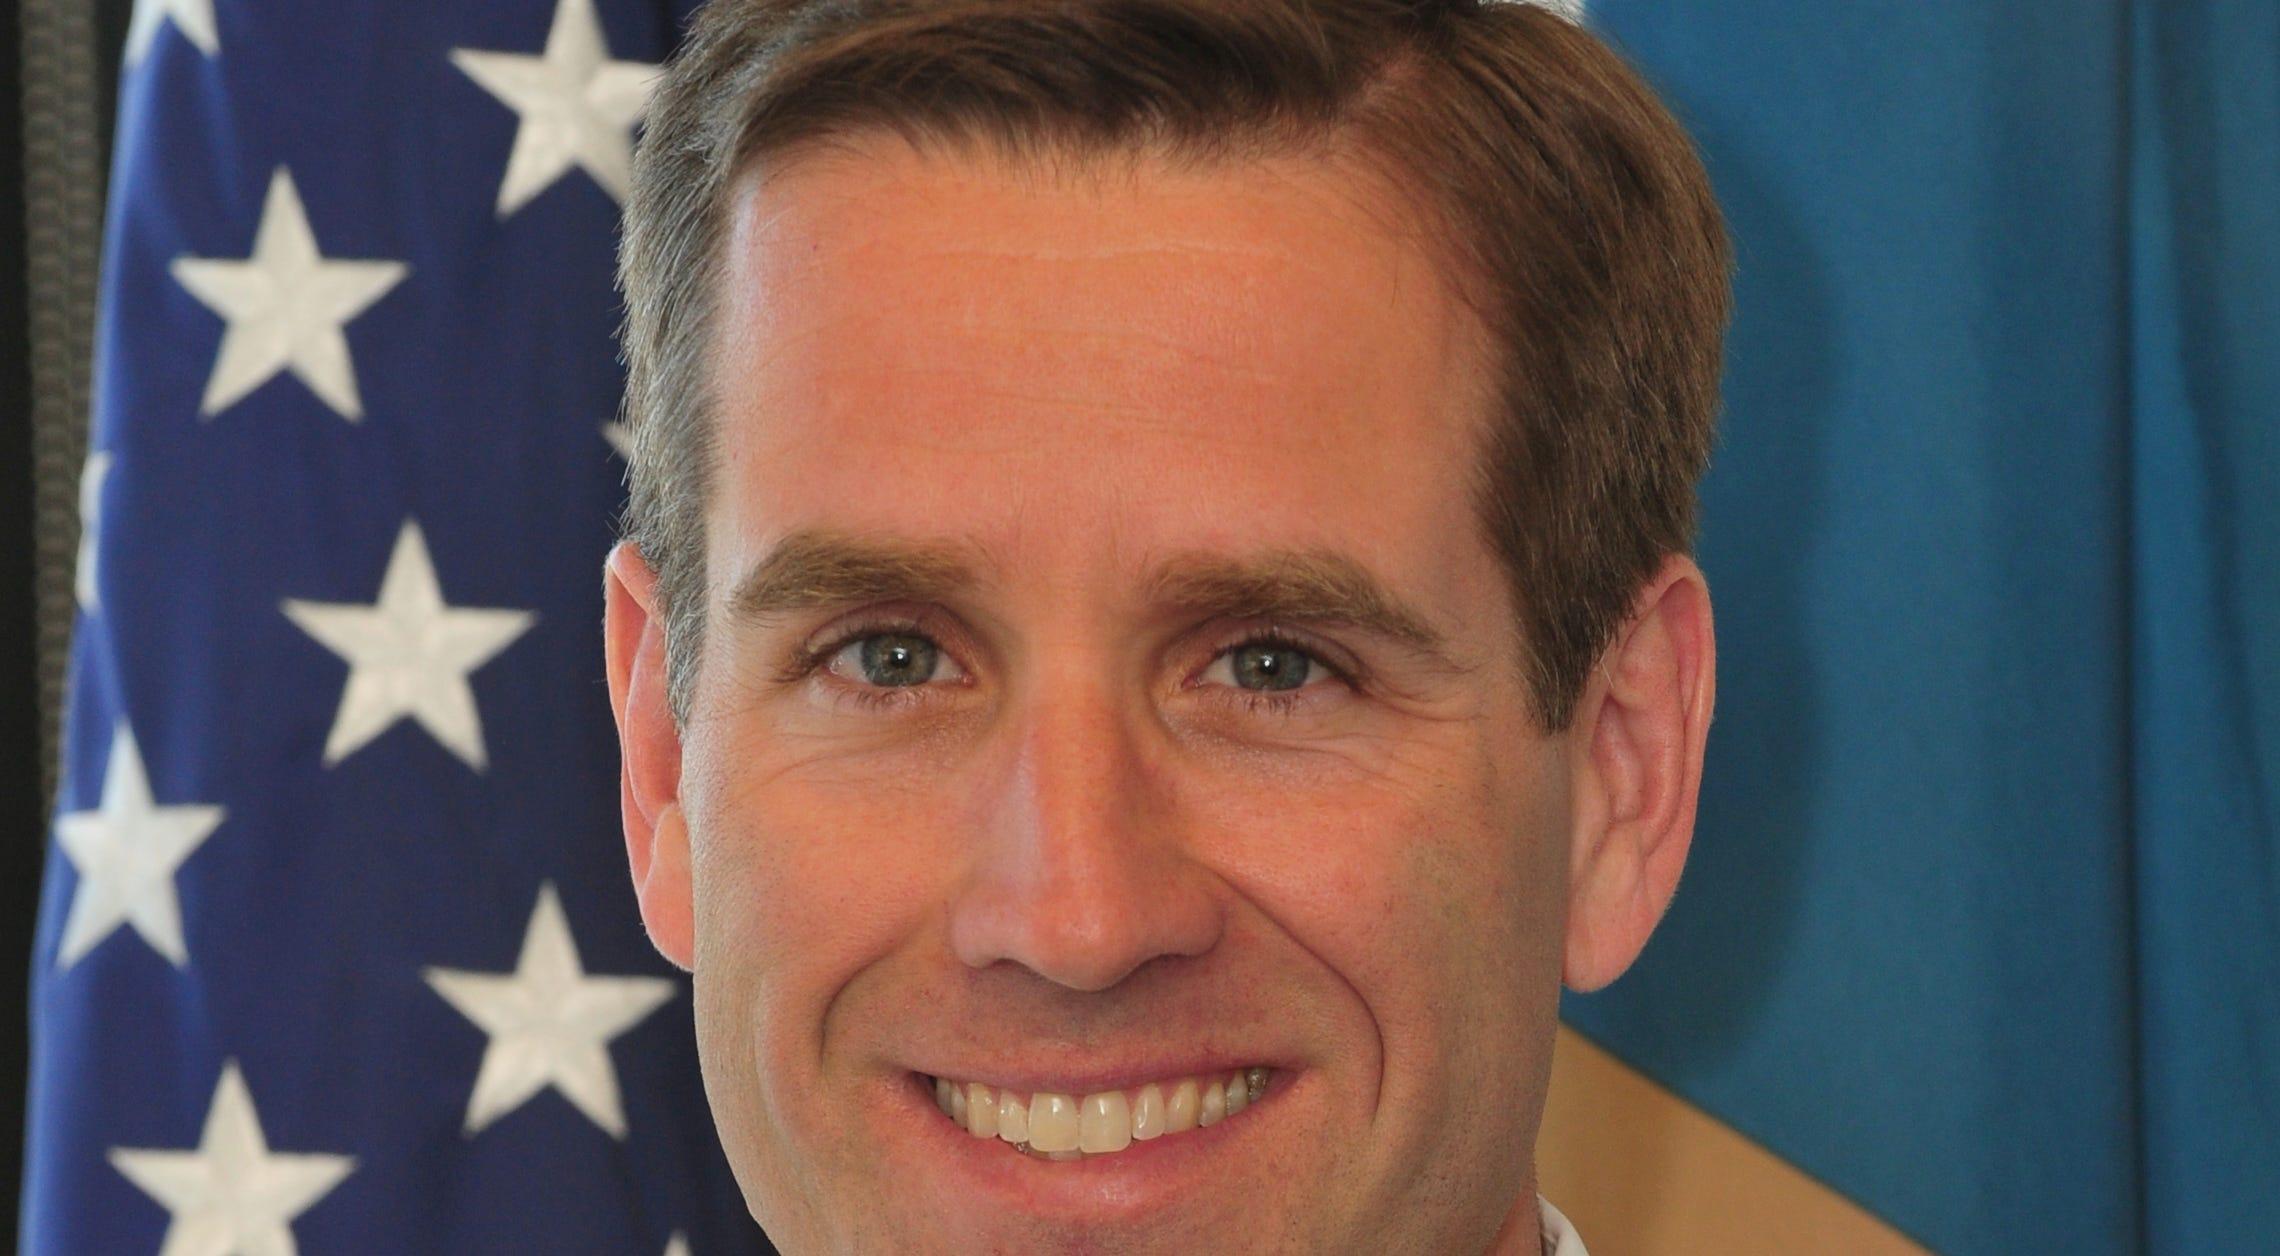 Former Delaware Attorney General Beau Biden